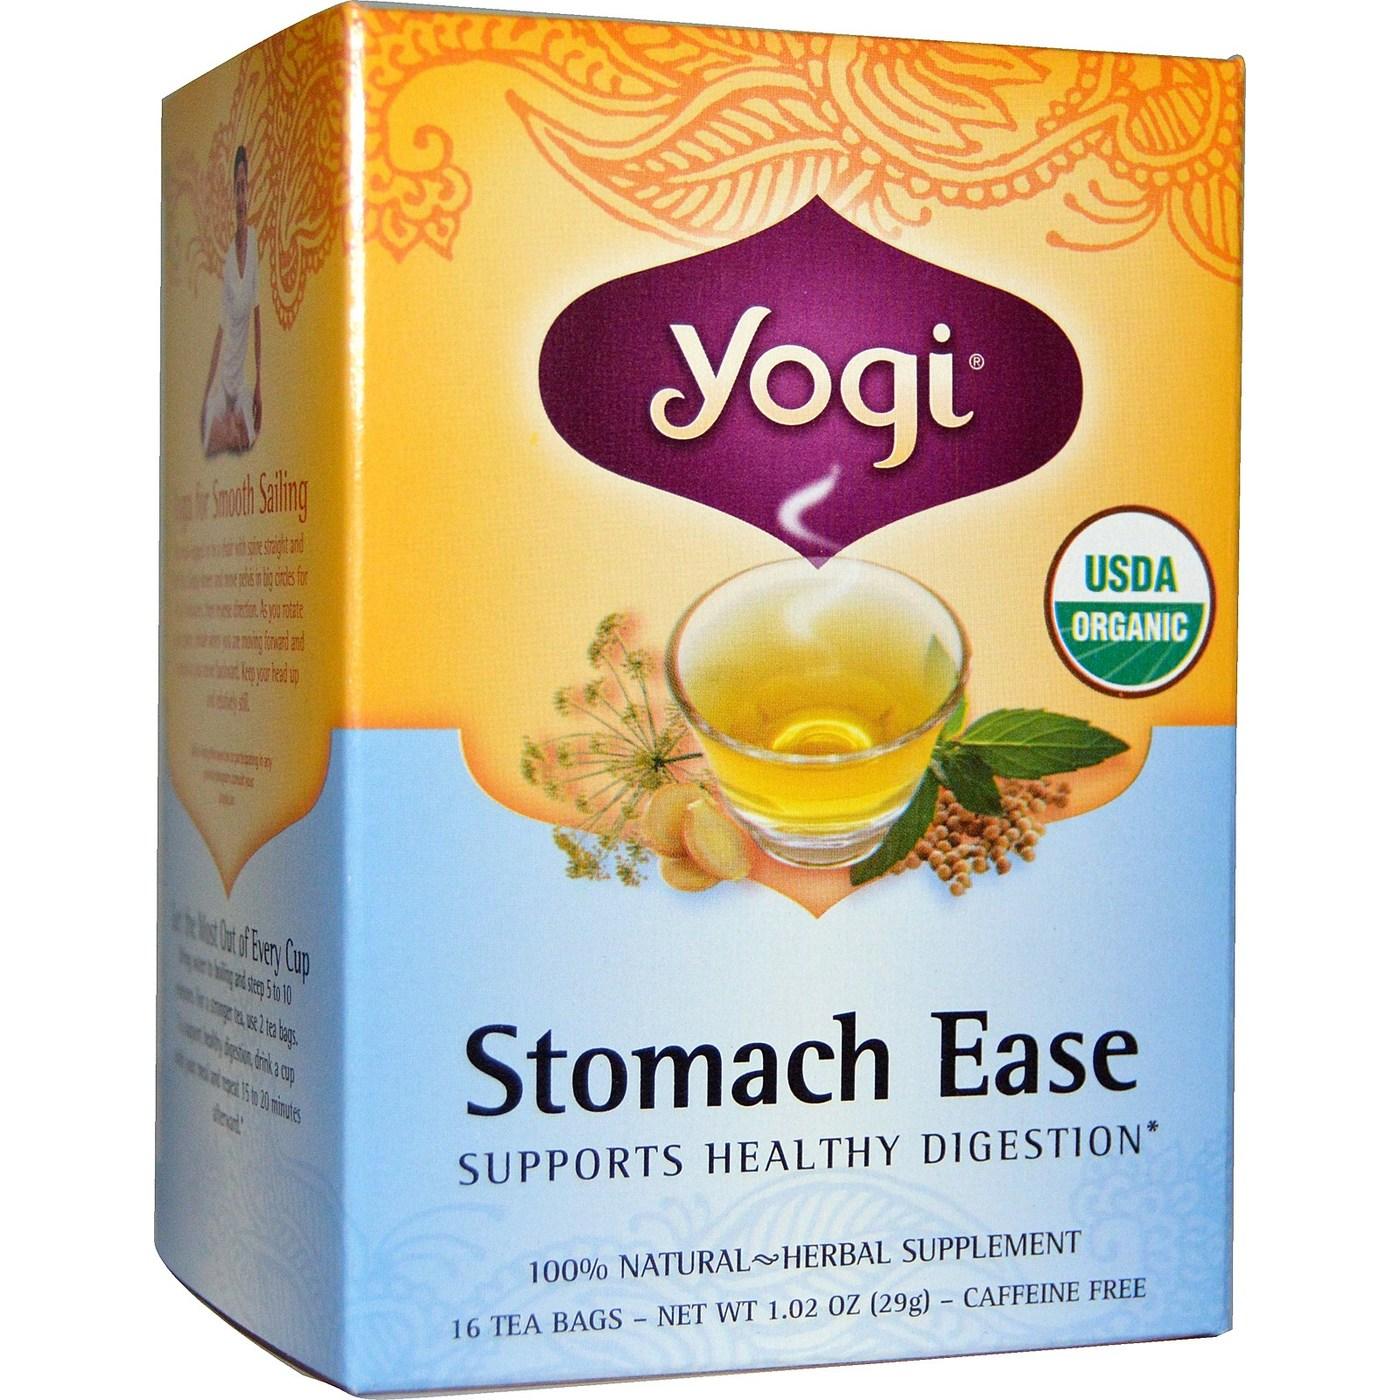 Yogi Tea Organic Teas Blend - Stomach